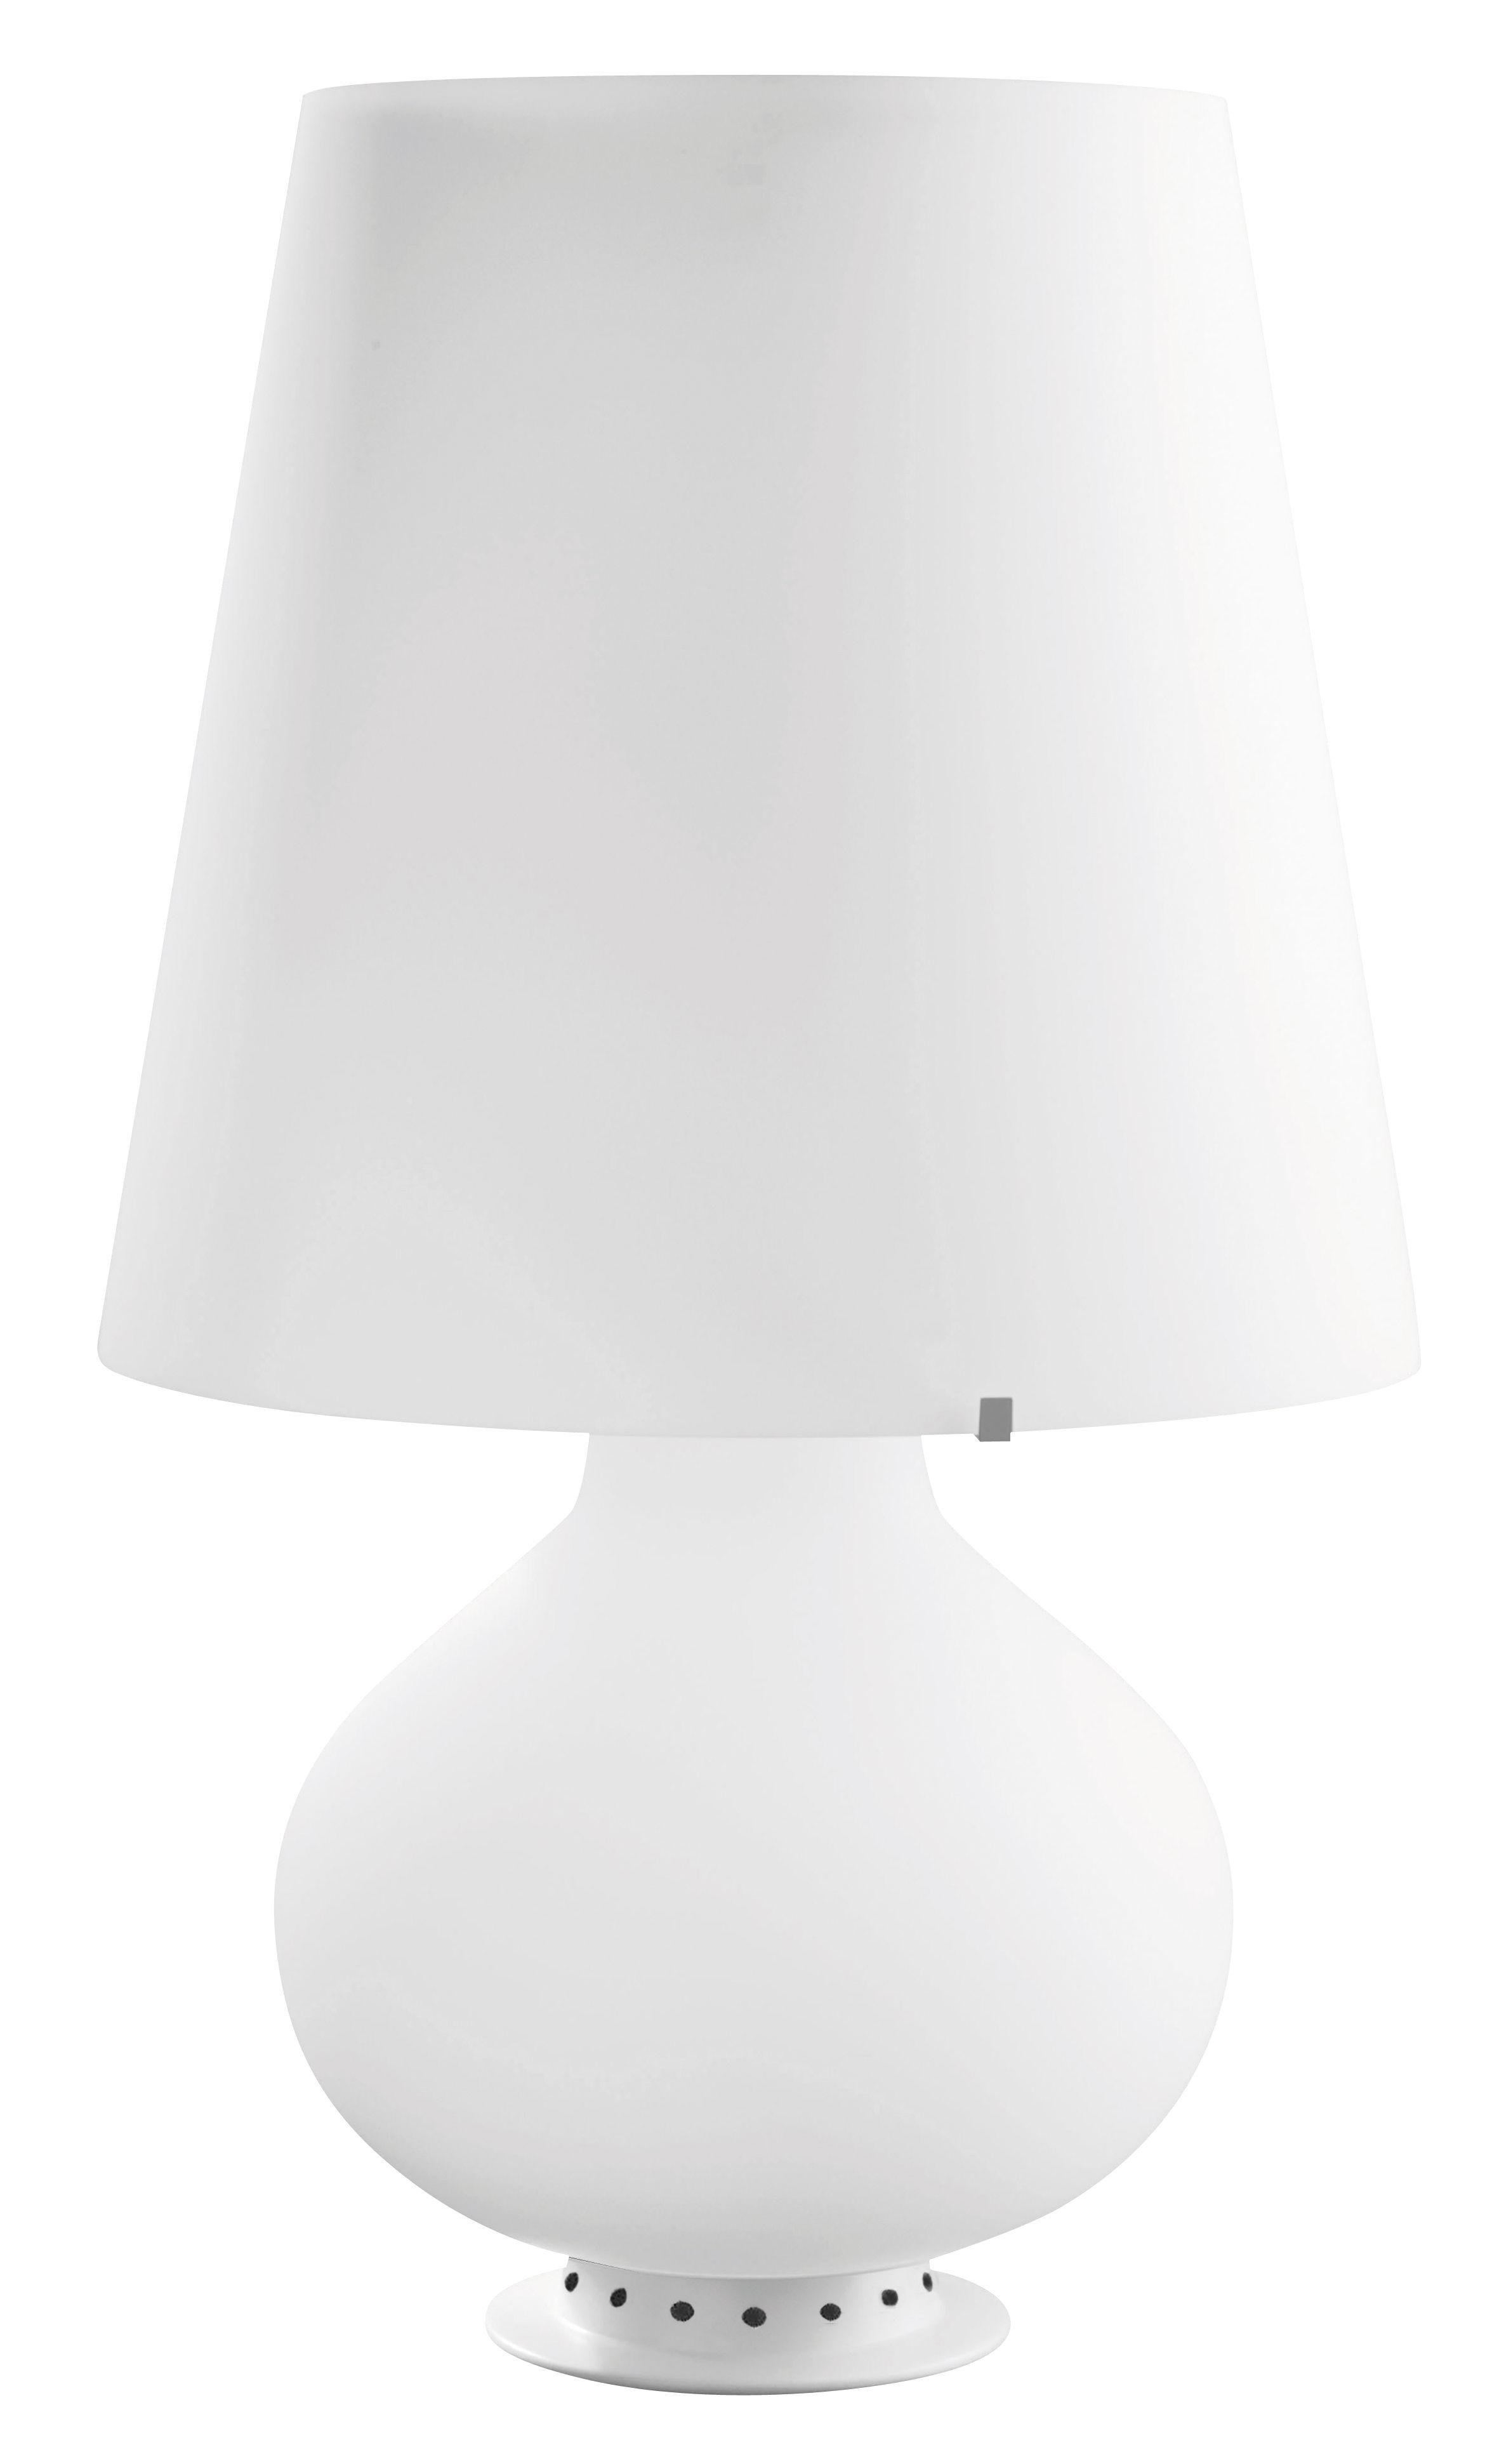 Luminaire - Lampes de table - Lampe Fontana - Fontana Arte - H 78 cm / Blanc - Métal, Verre soufflé